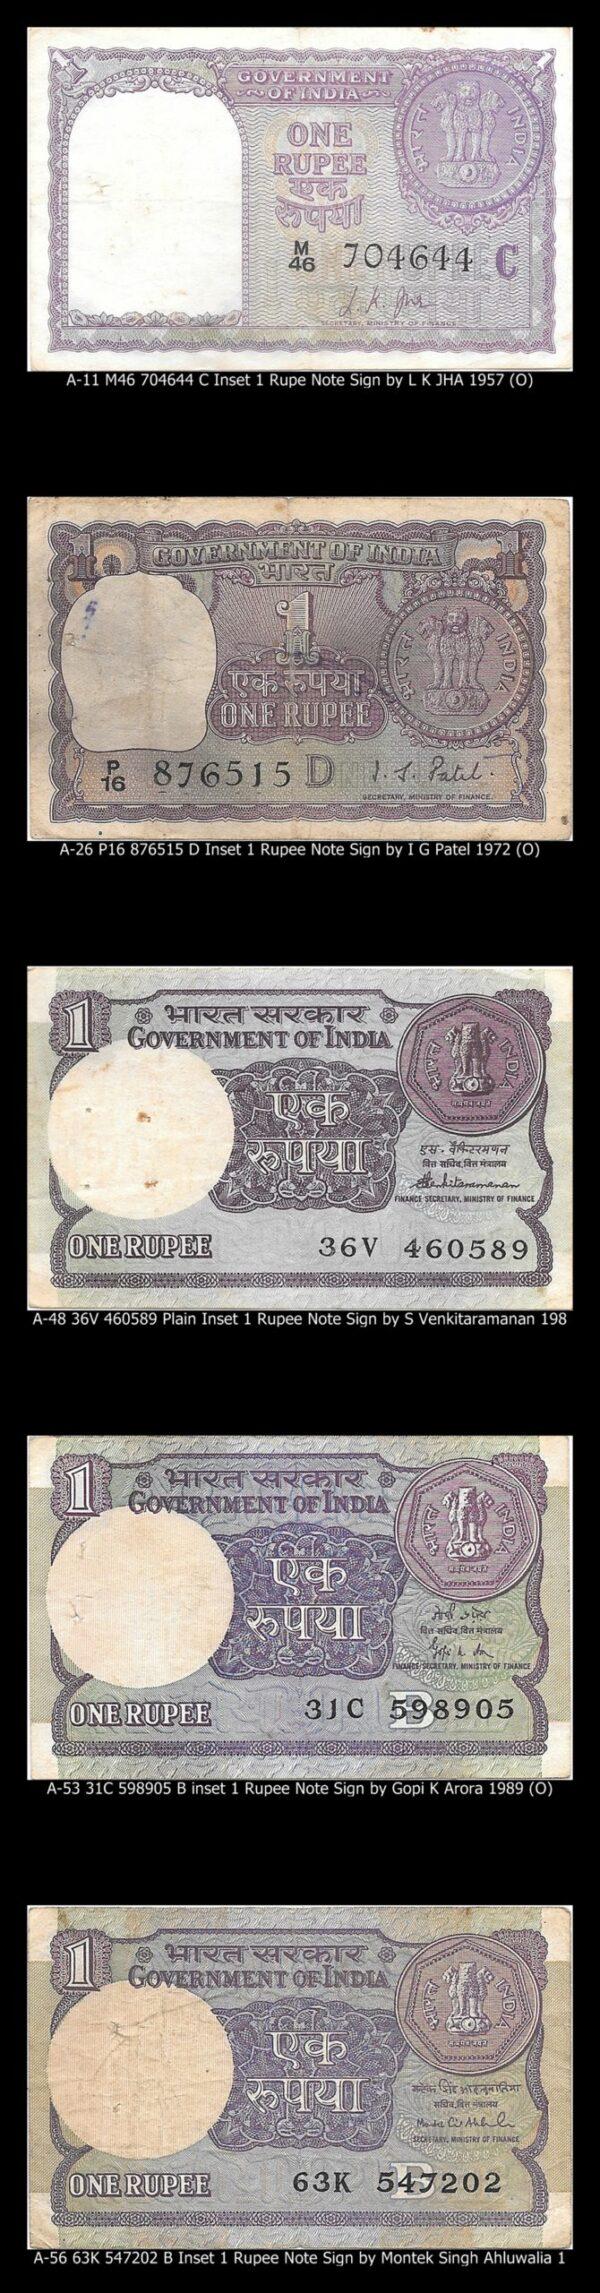 1 Rupee Note O